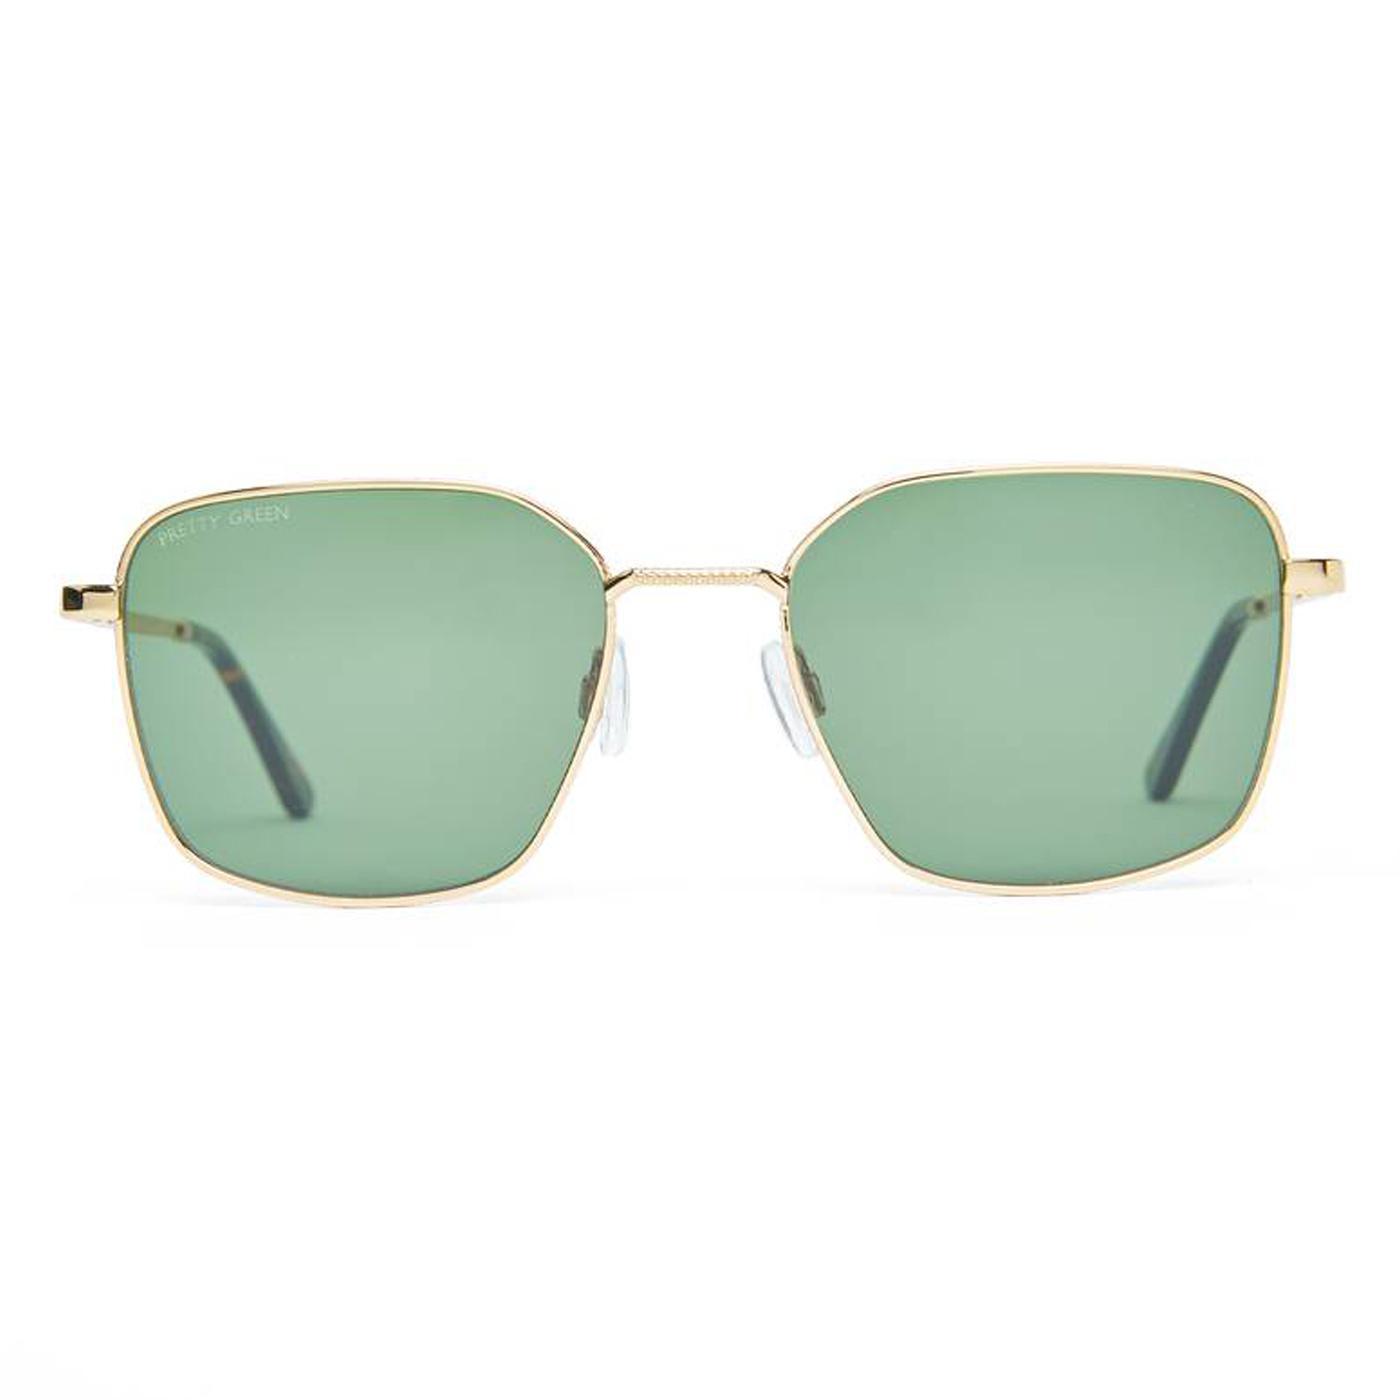 PRETTY GREEN Mod Square Frame Aviator Sunglasses G